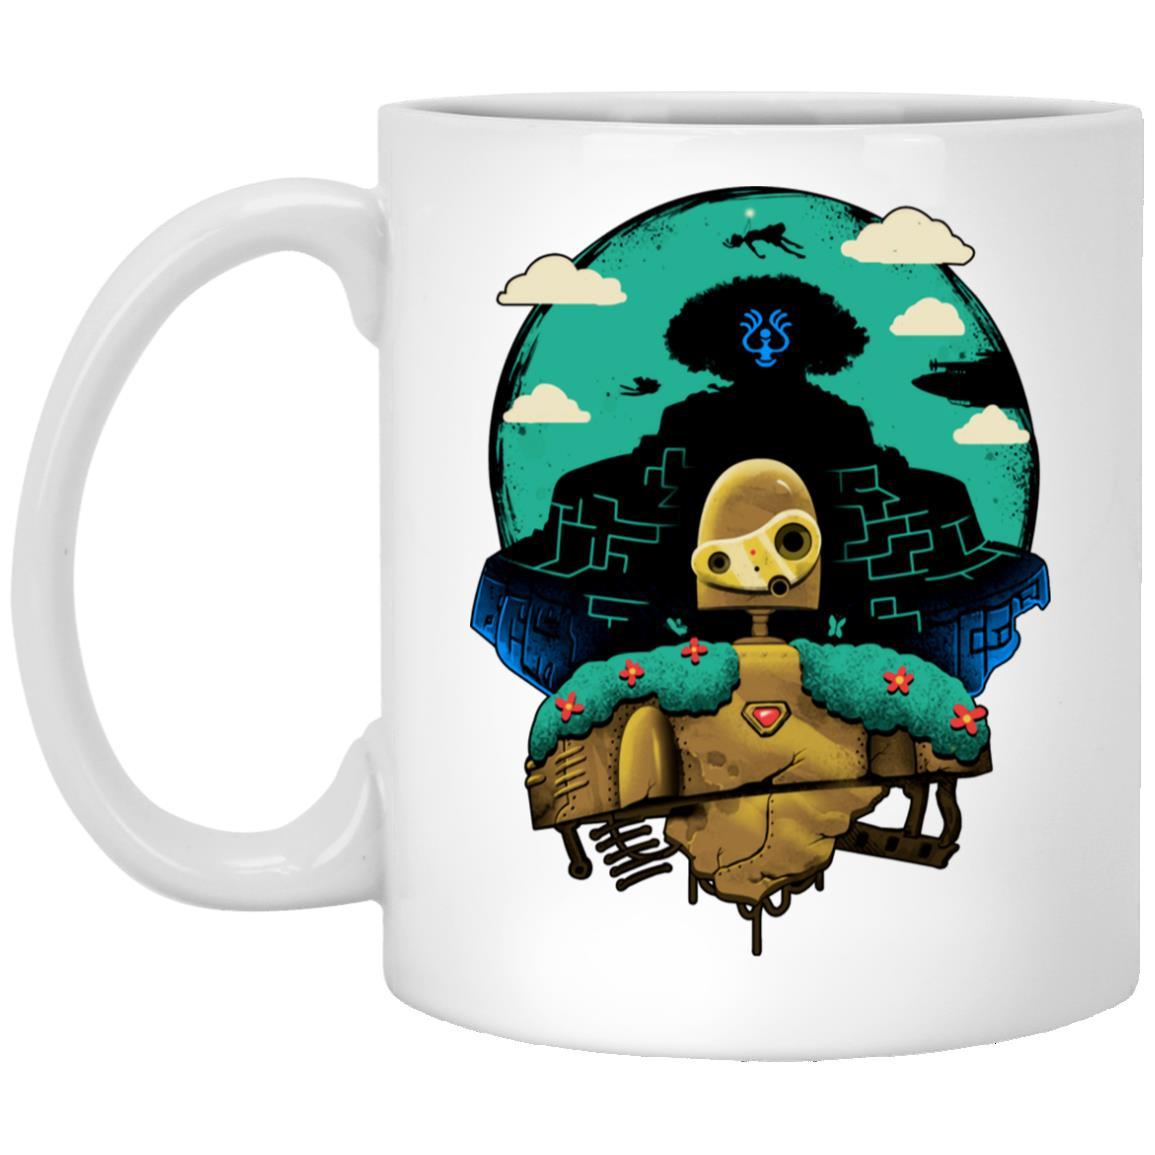 Laputa: Castle in The Sky and Warrior Robot Mug